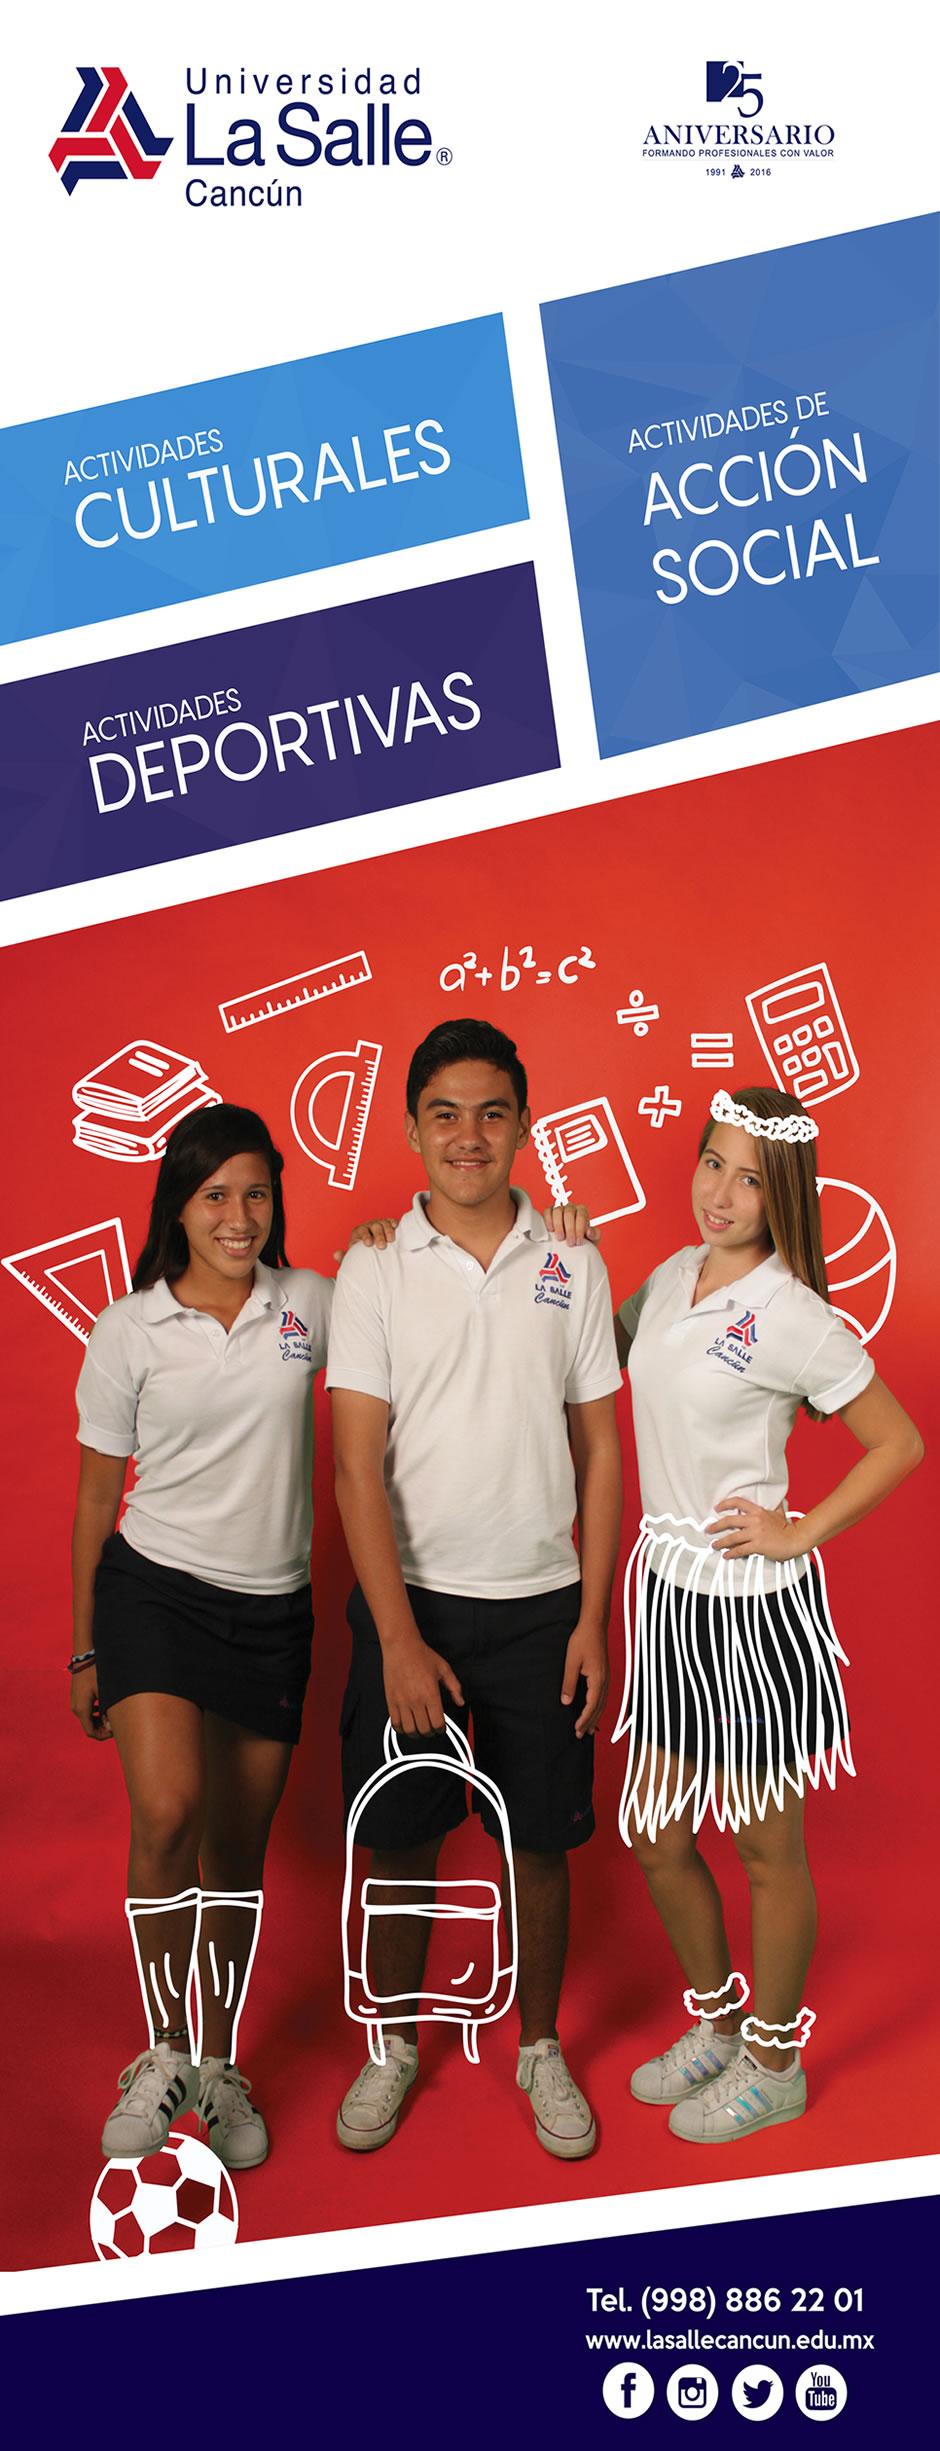 Universidad La Salle Cancun